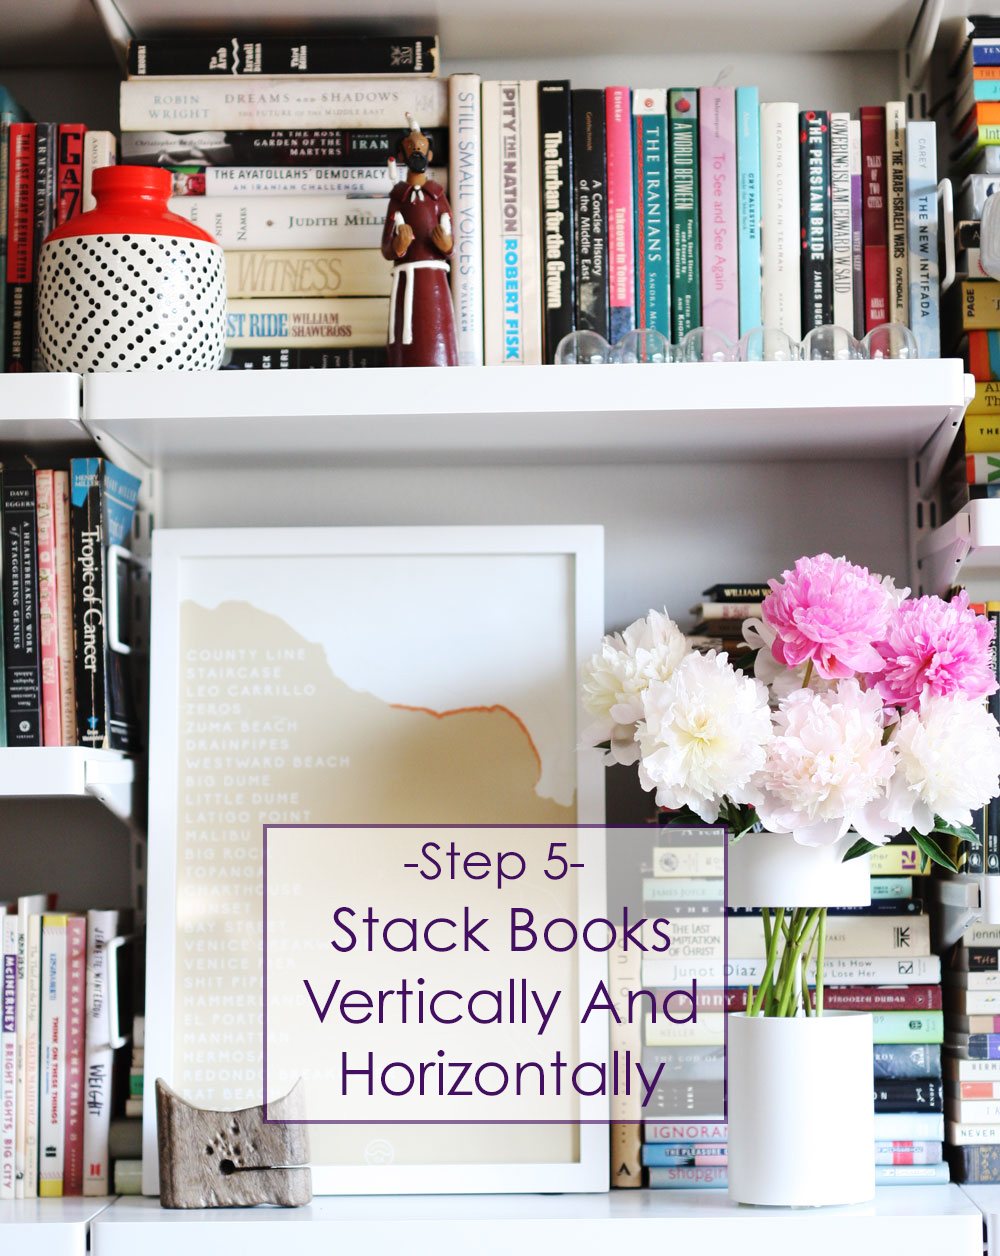 5 Stack Books Vertically And Horizontally